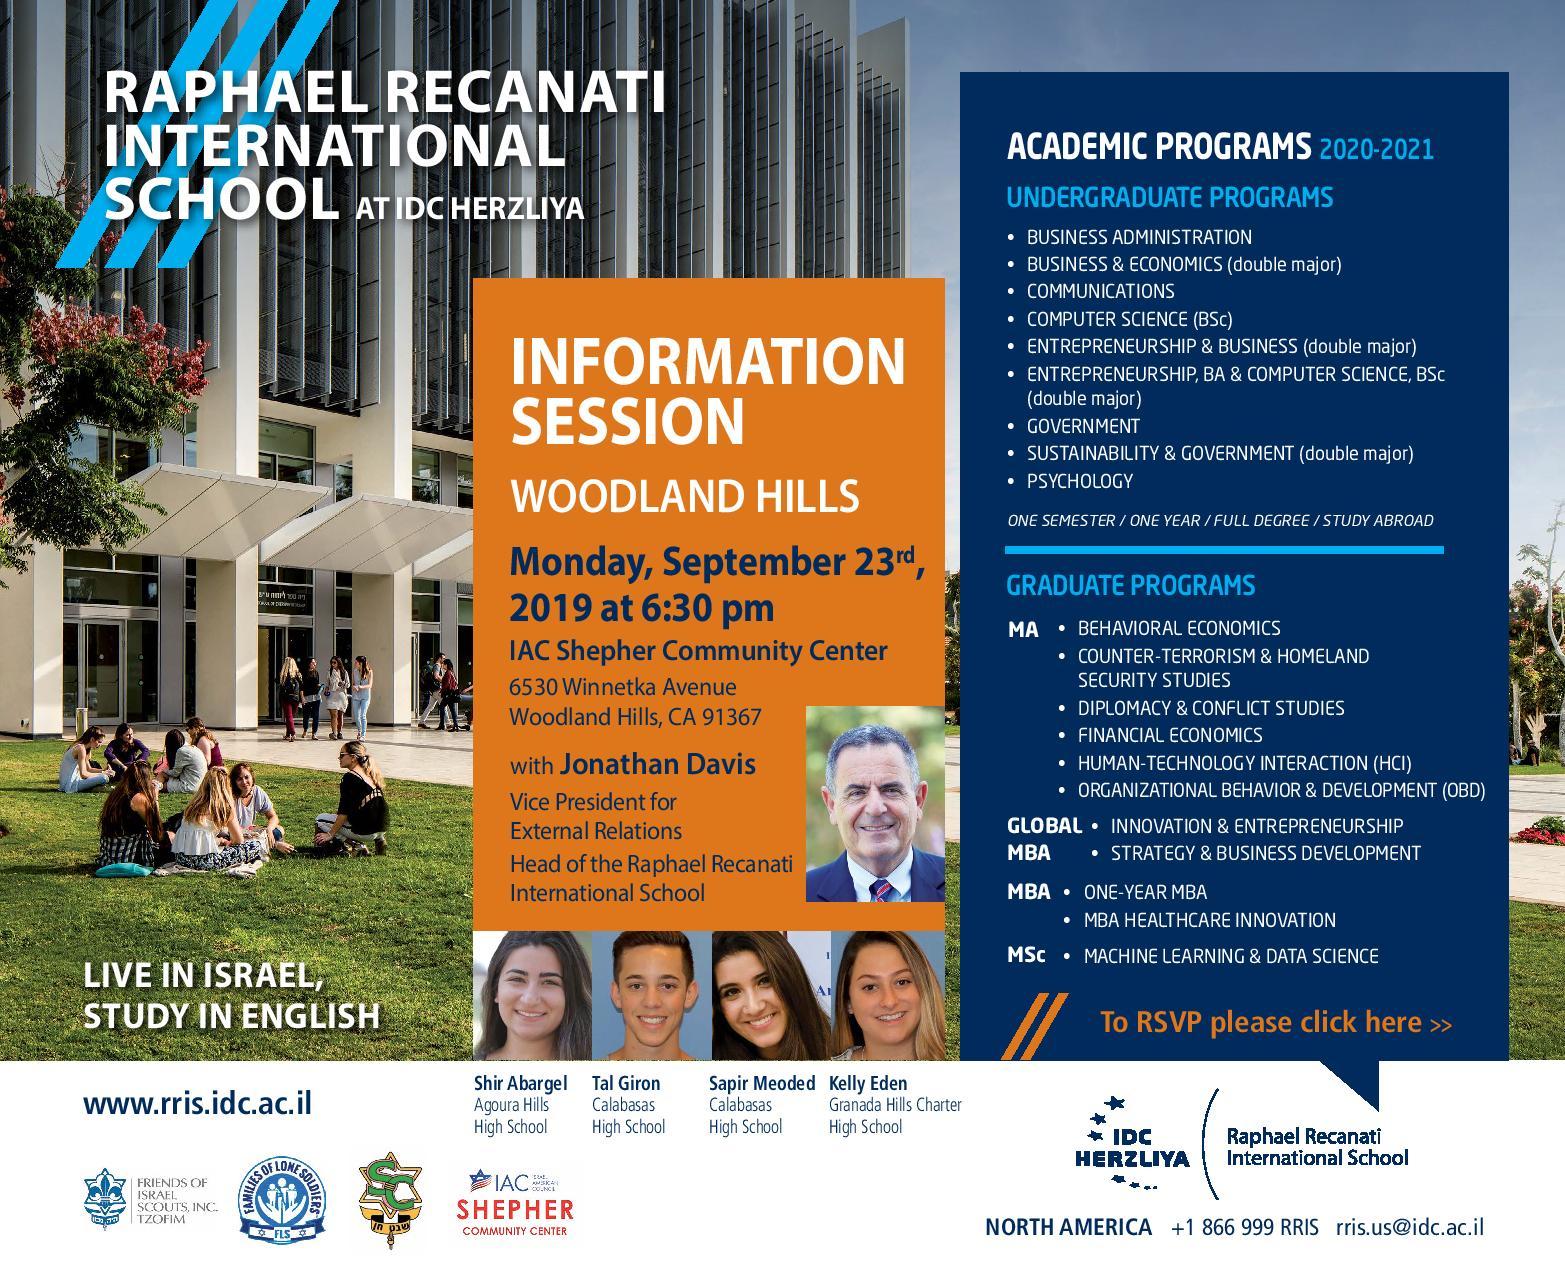 Idc Herzliya Raphael Recanati International School Regarding Woodland Hills School District Calendar